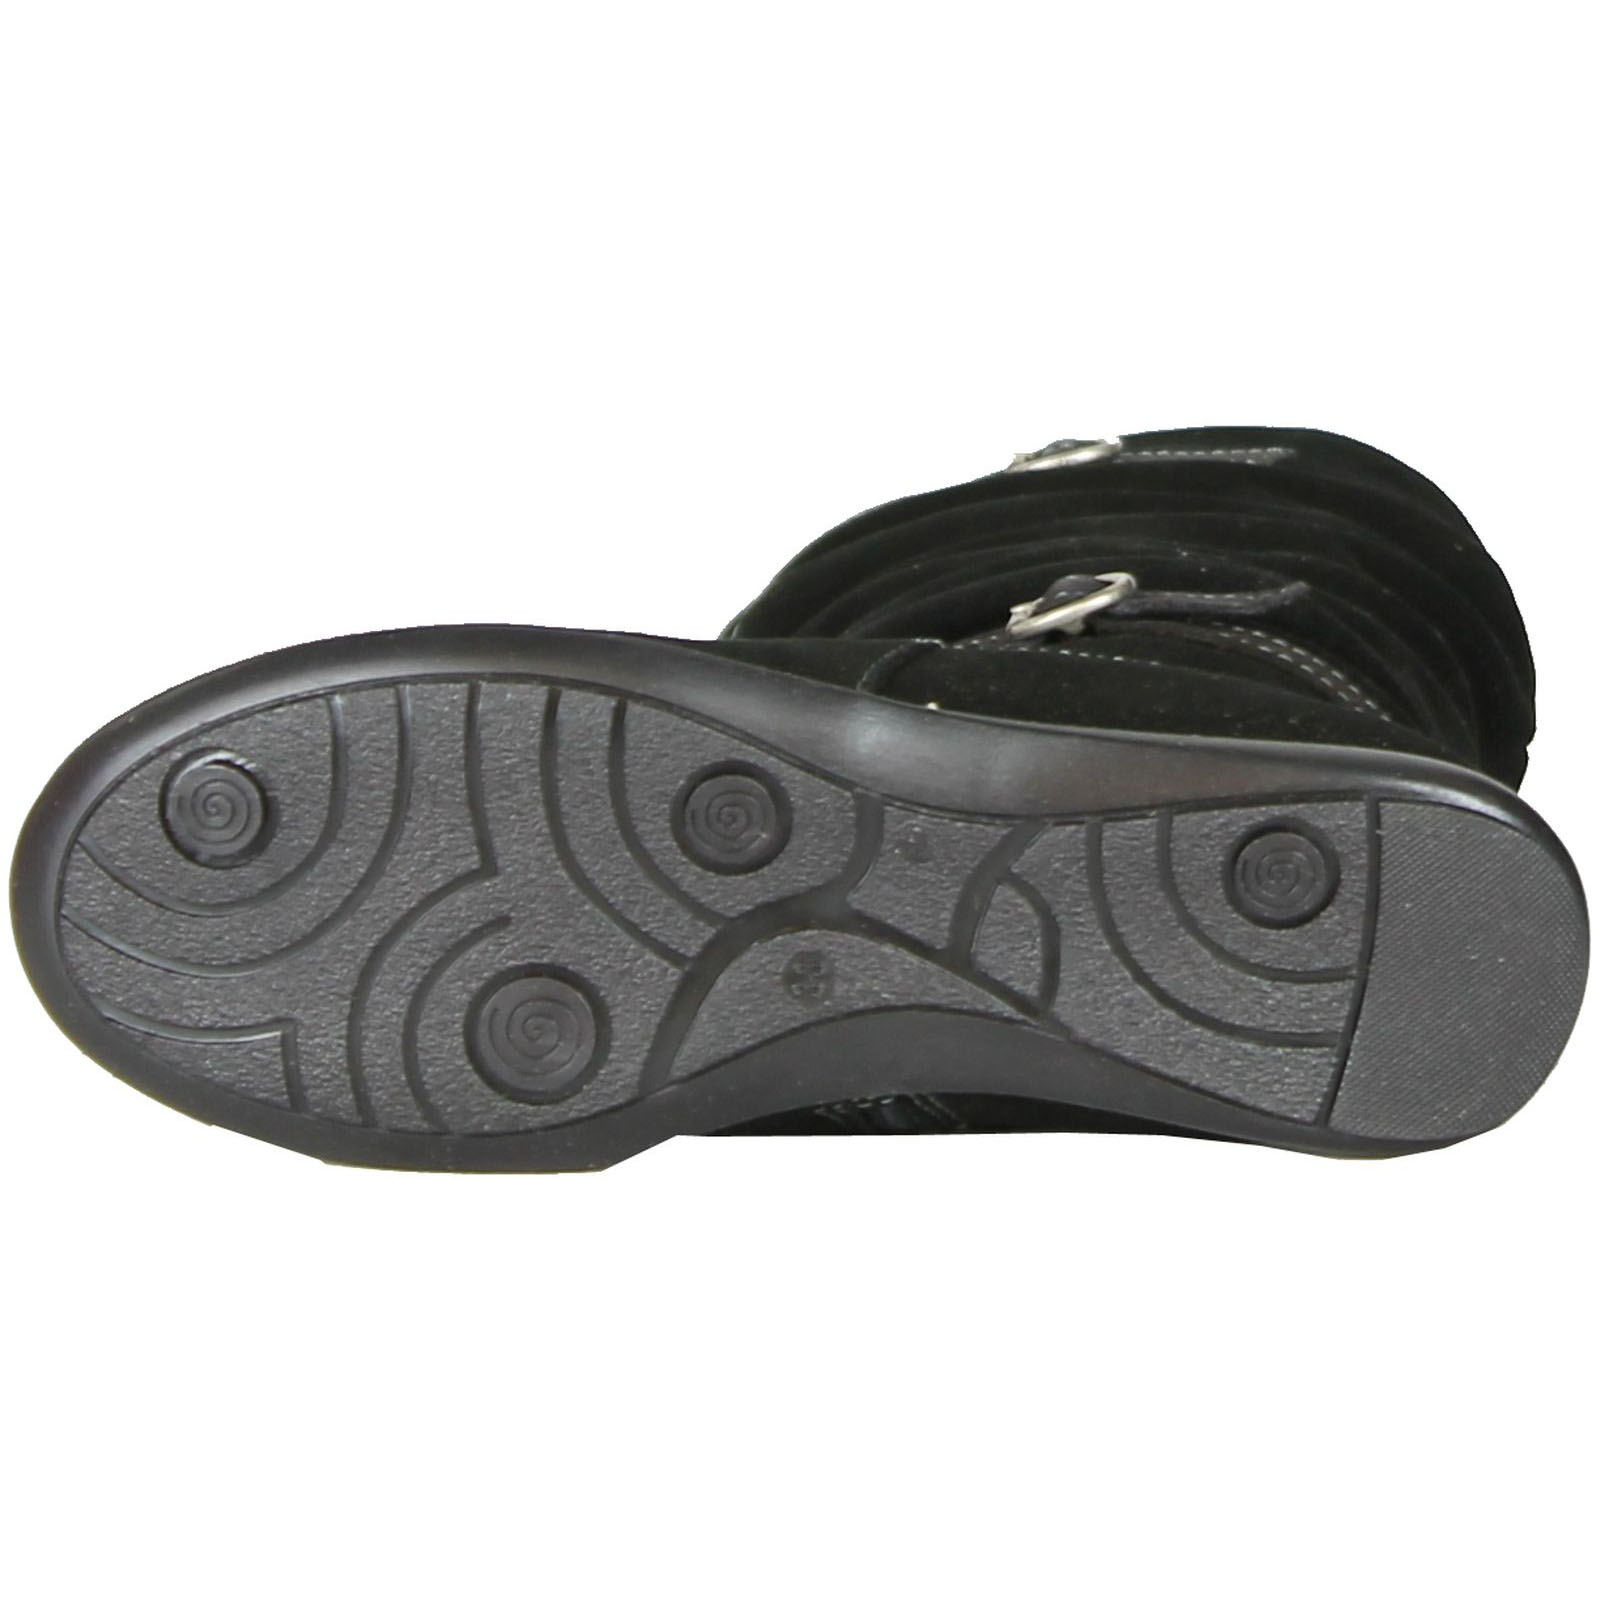 IMAC Kids sneakers size 6//6.5 or EU 38